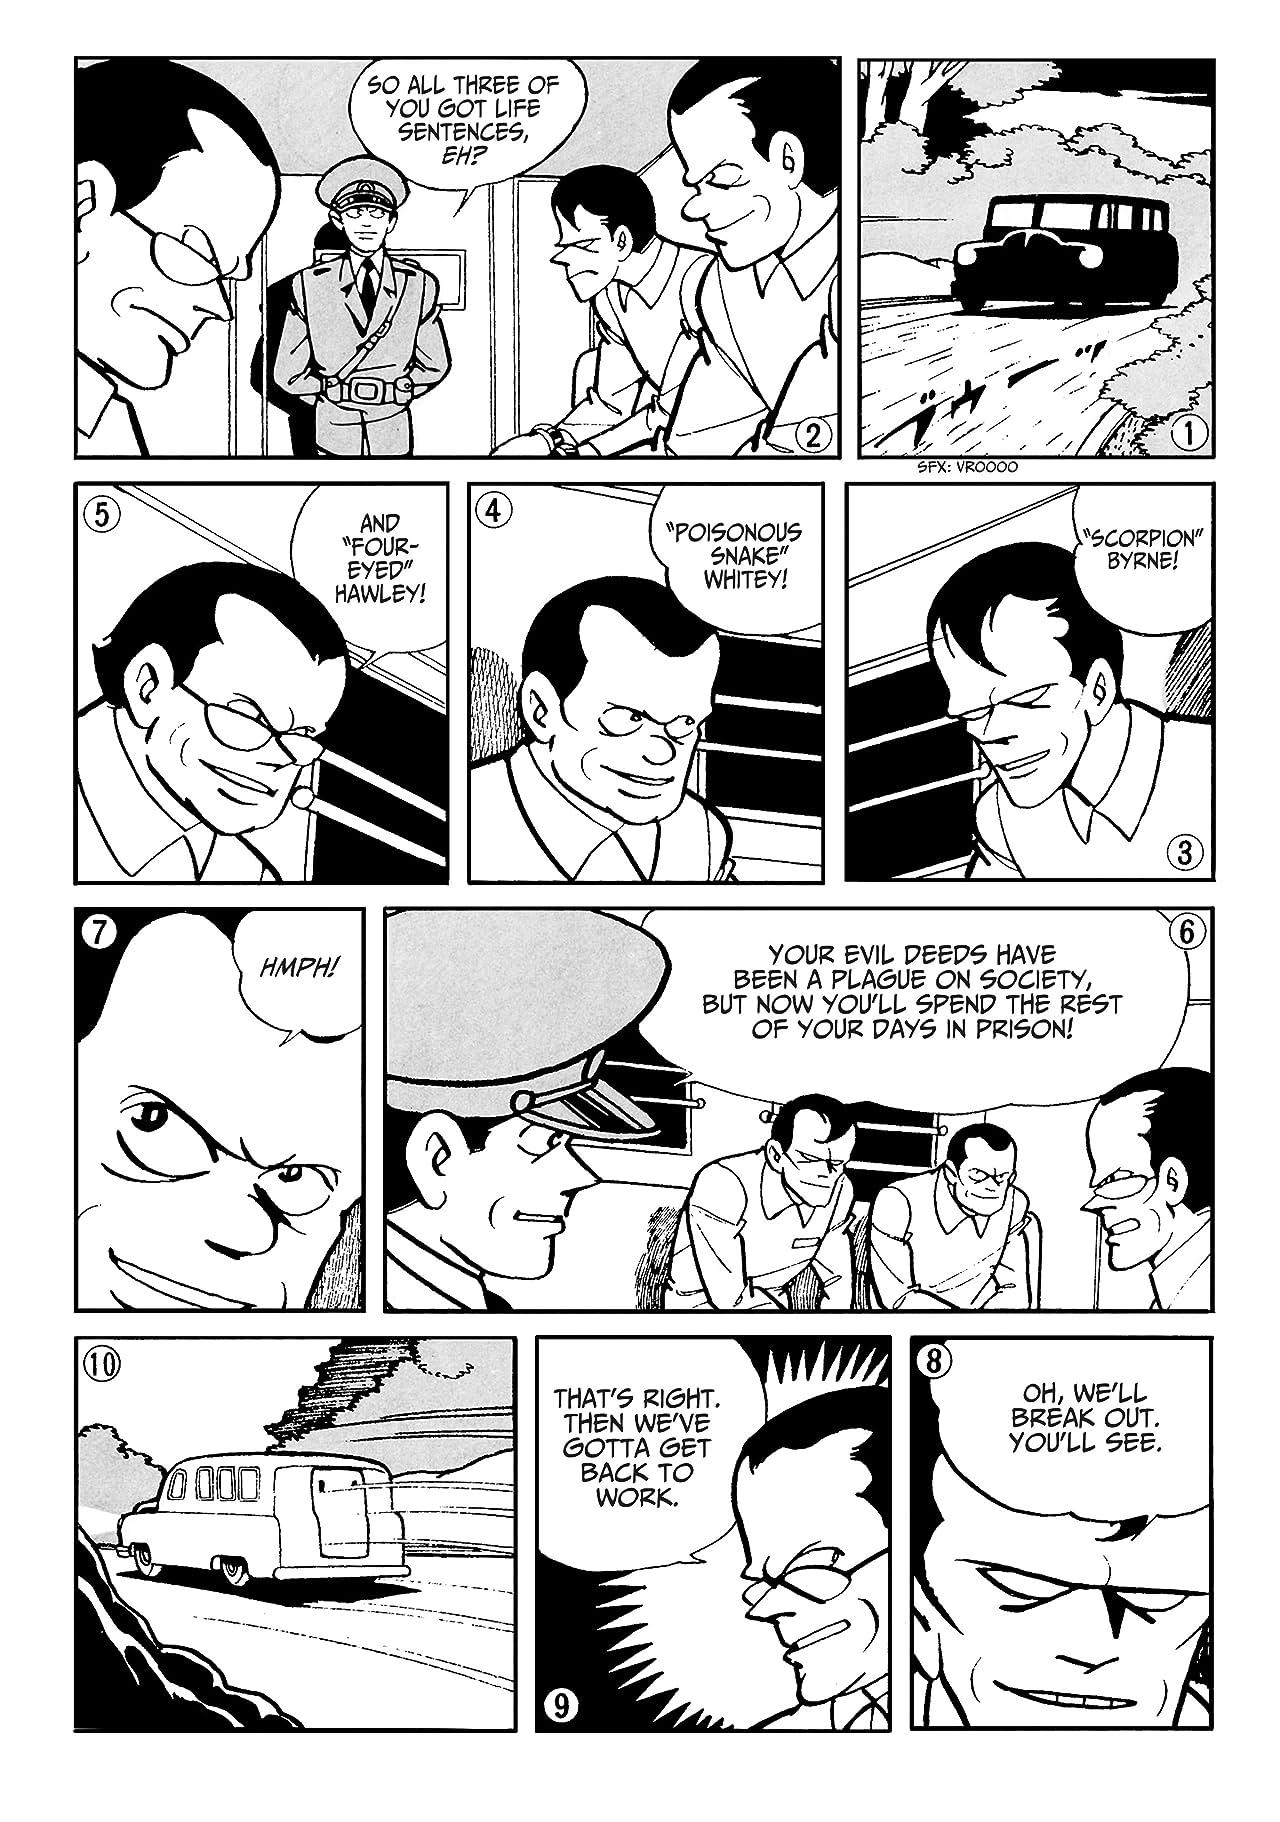 Batman: The Jiro Kuwata Batmanga #44